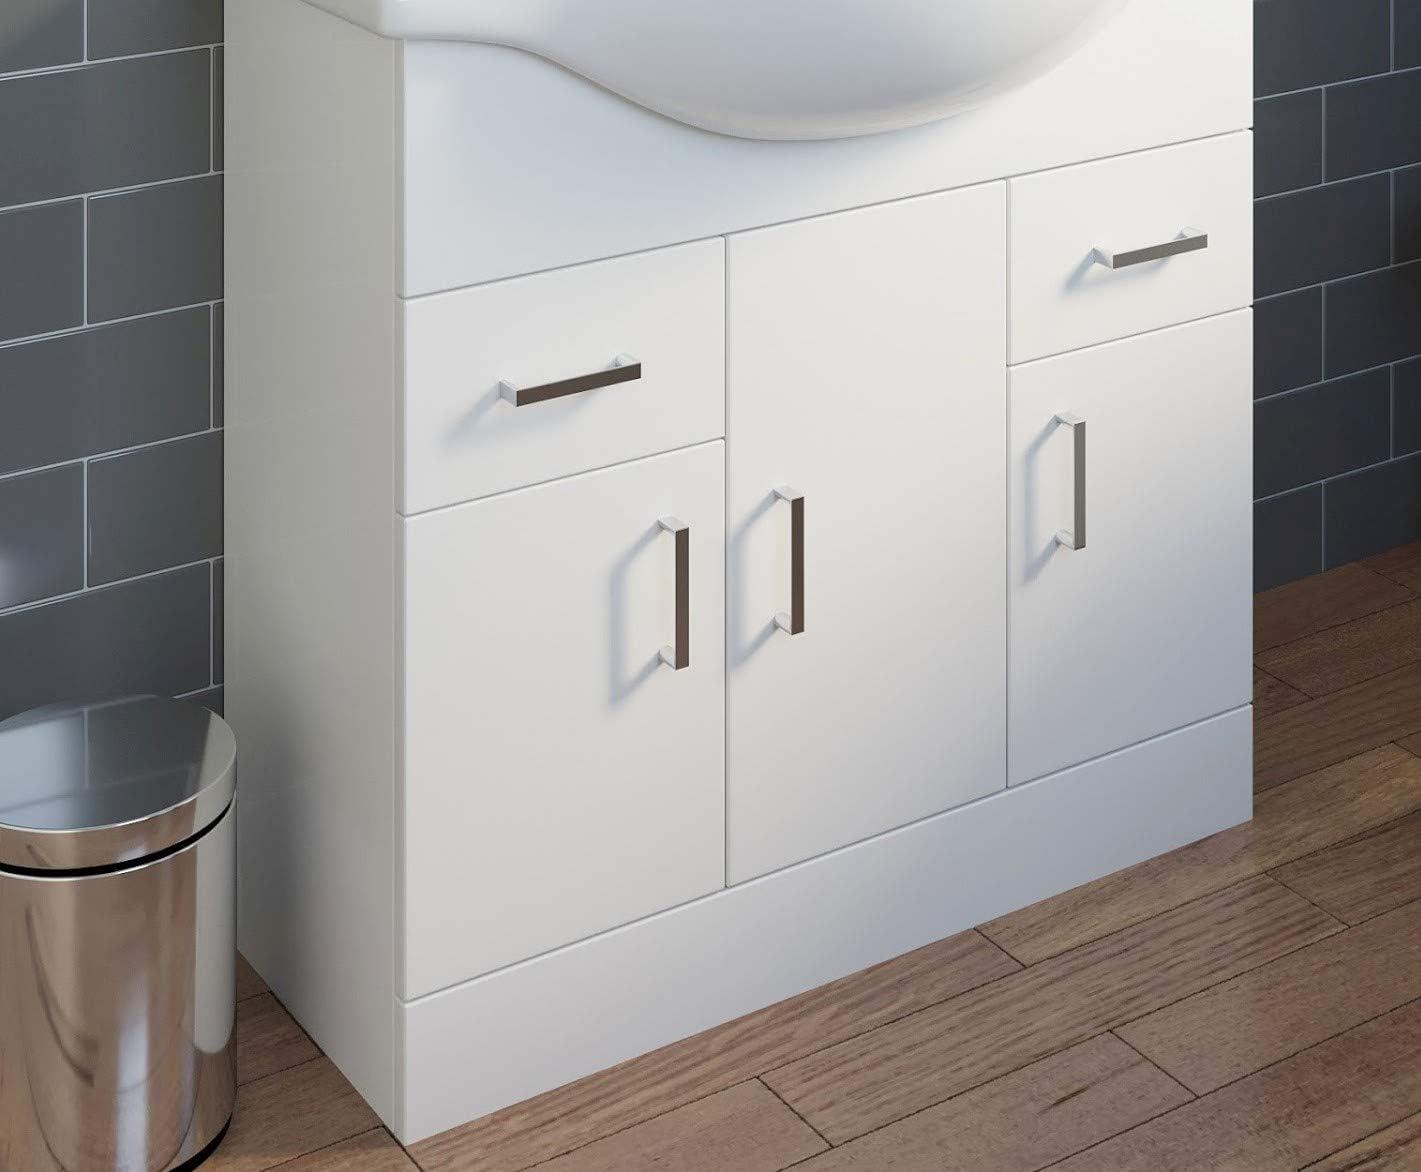 BASIN /& TAP NOT INCLUDED Plumbworld 850mm Floorstanding Bathroom Vanity Unit ONLY